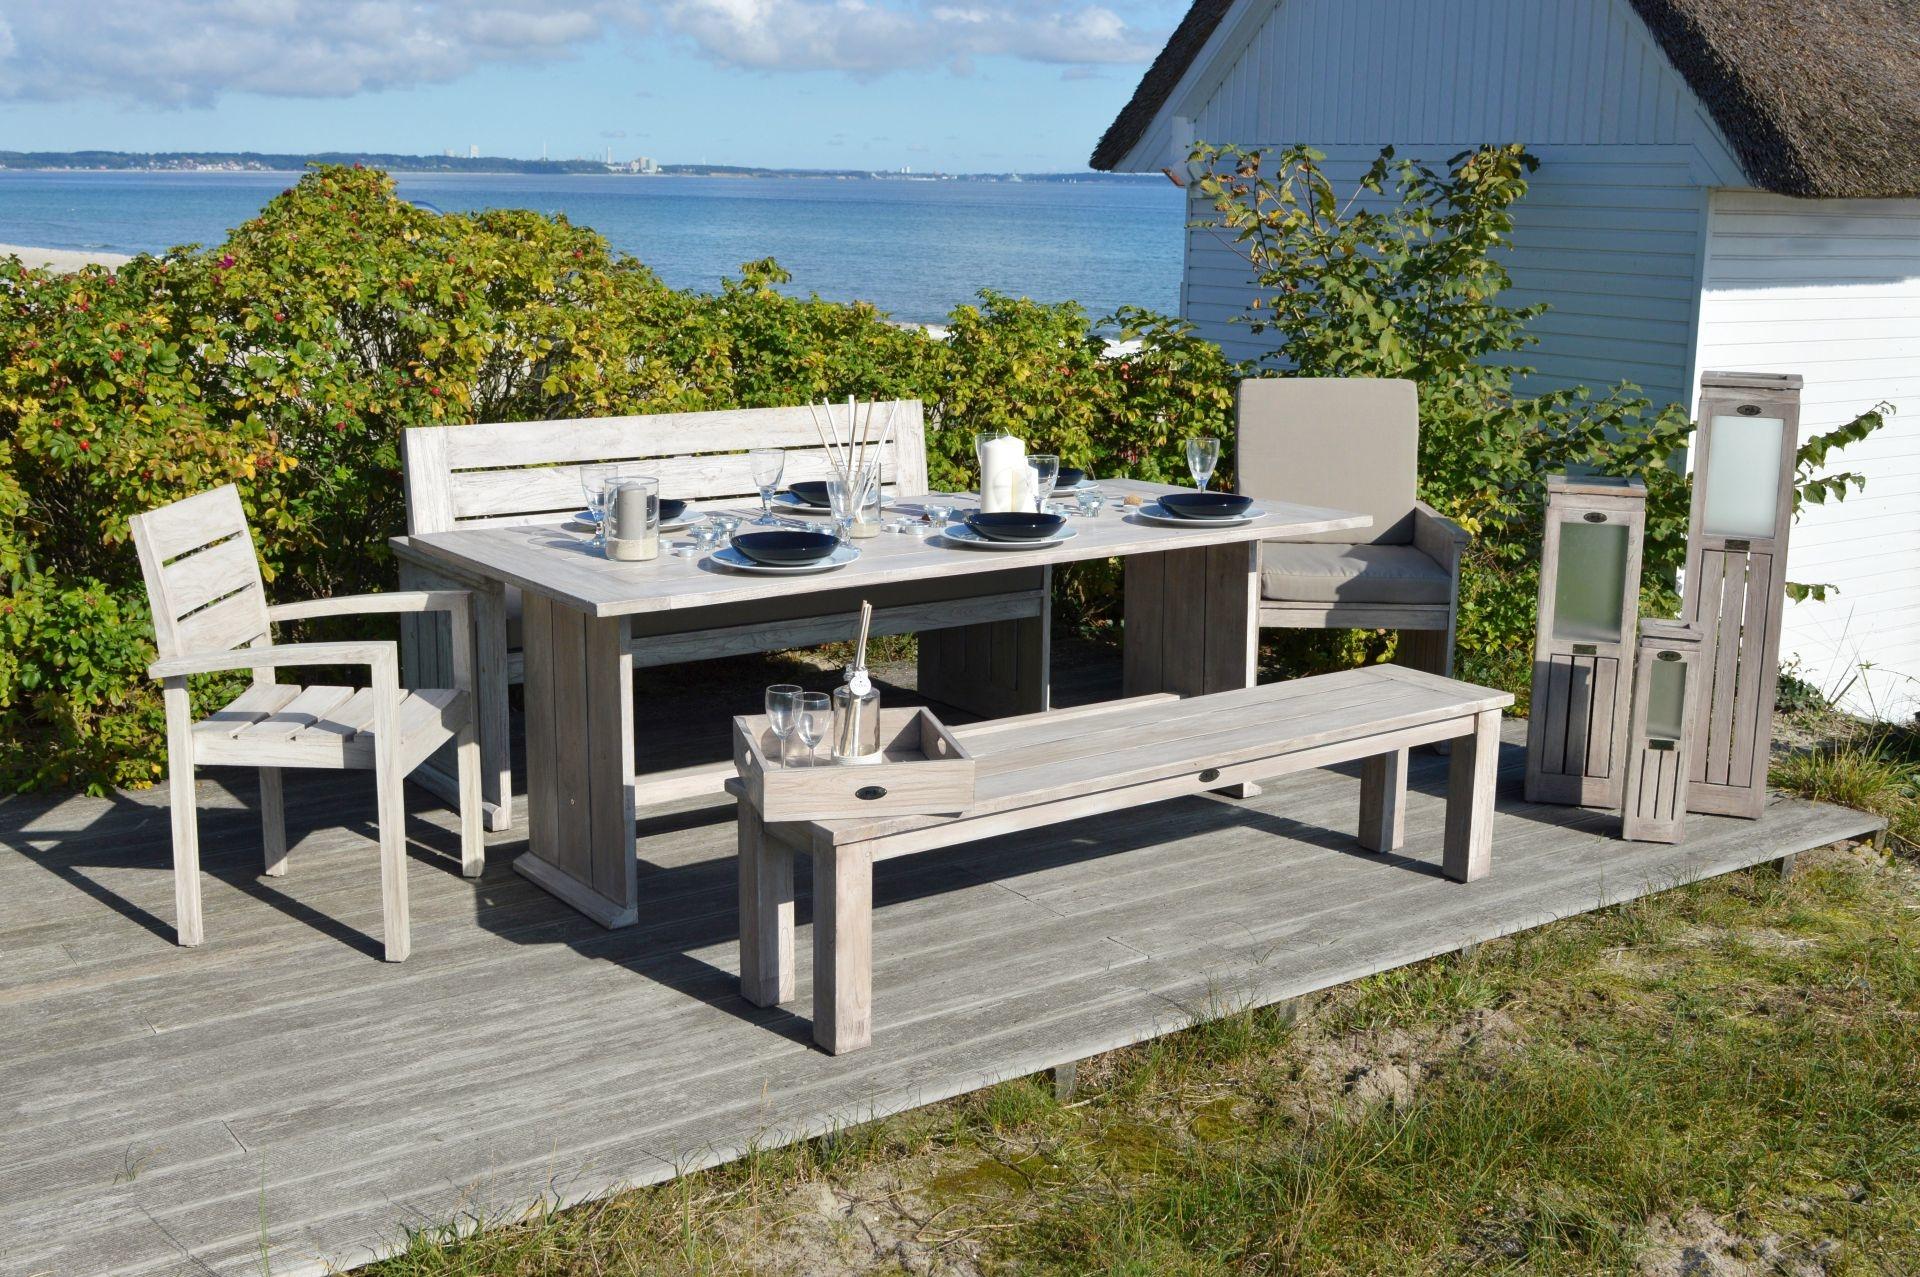 markant m bel der massivholzspezialist gmbh kaarst 41564 yellowmap. Black Bedroom Furniture Sets. Home Design Ideas